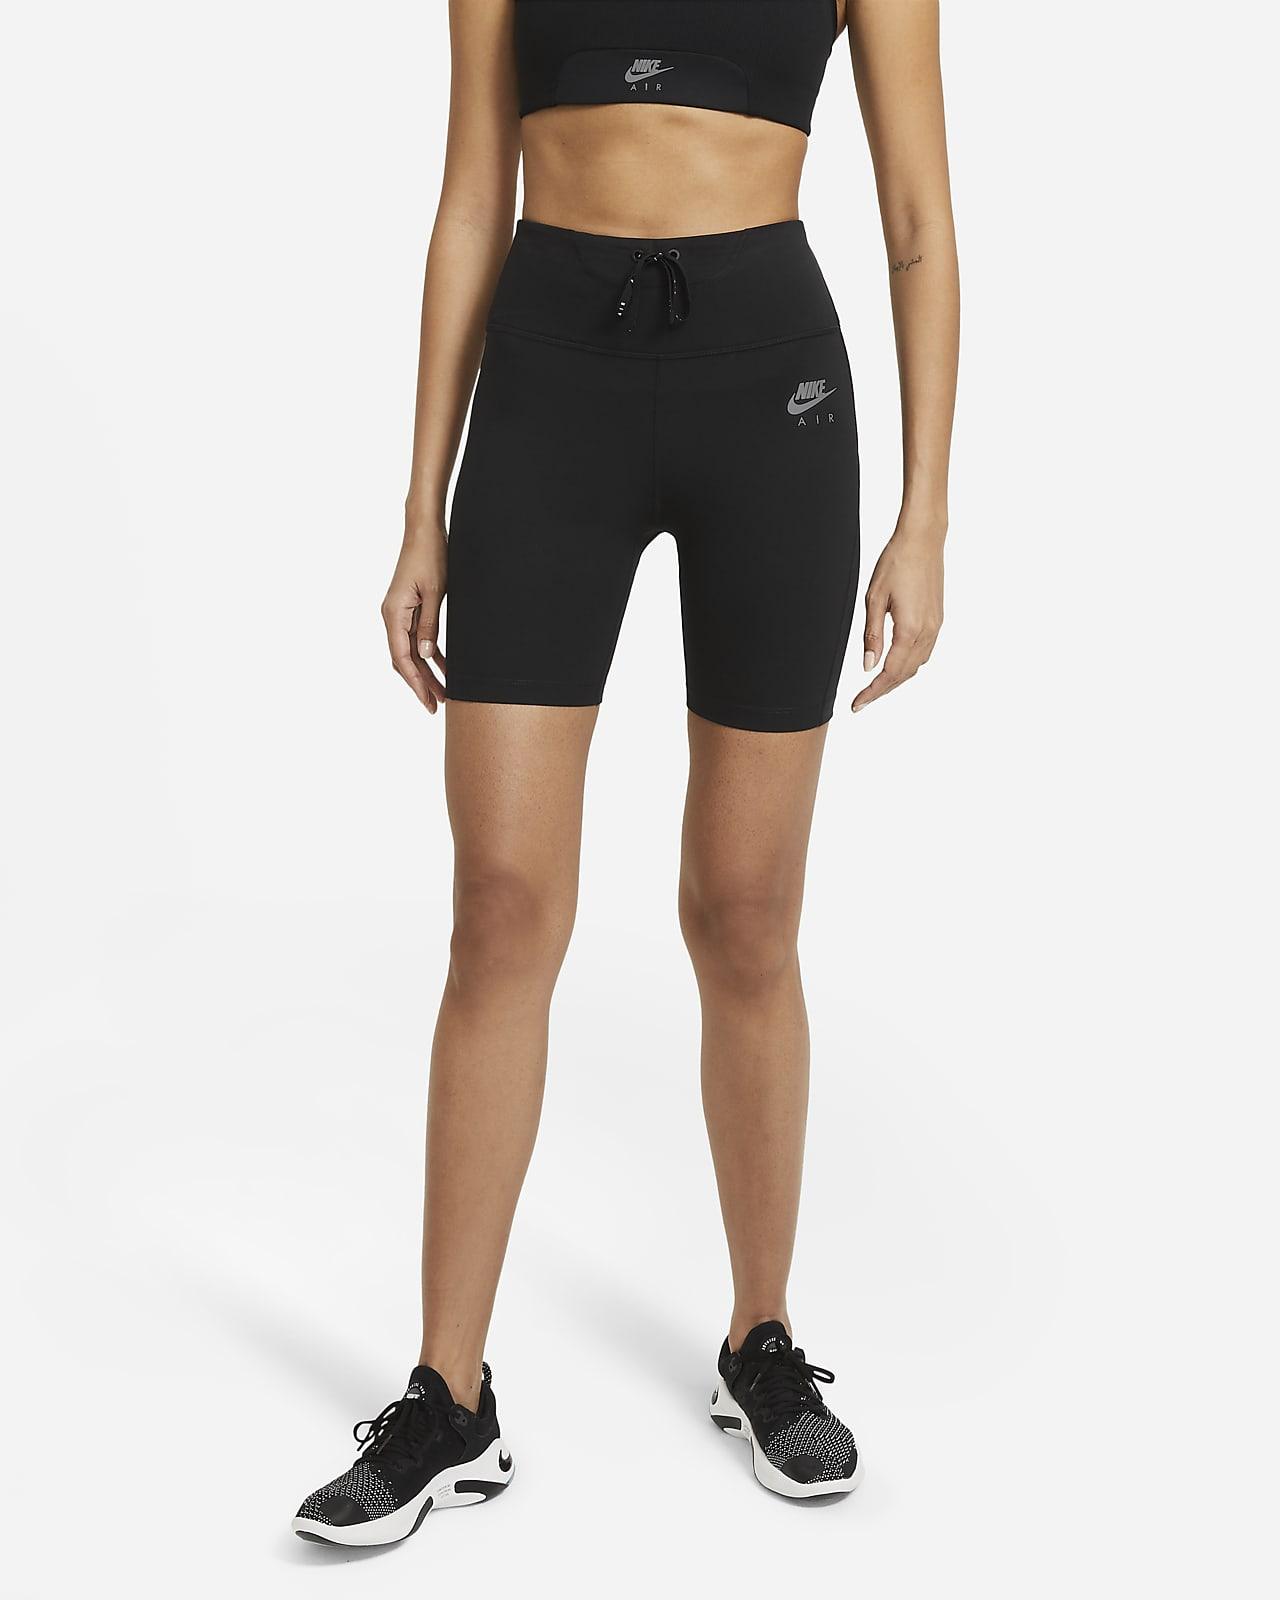 Nike Air testhezálló női futórövidnadrág